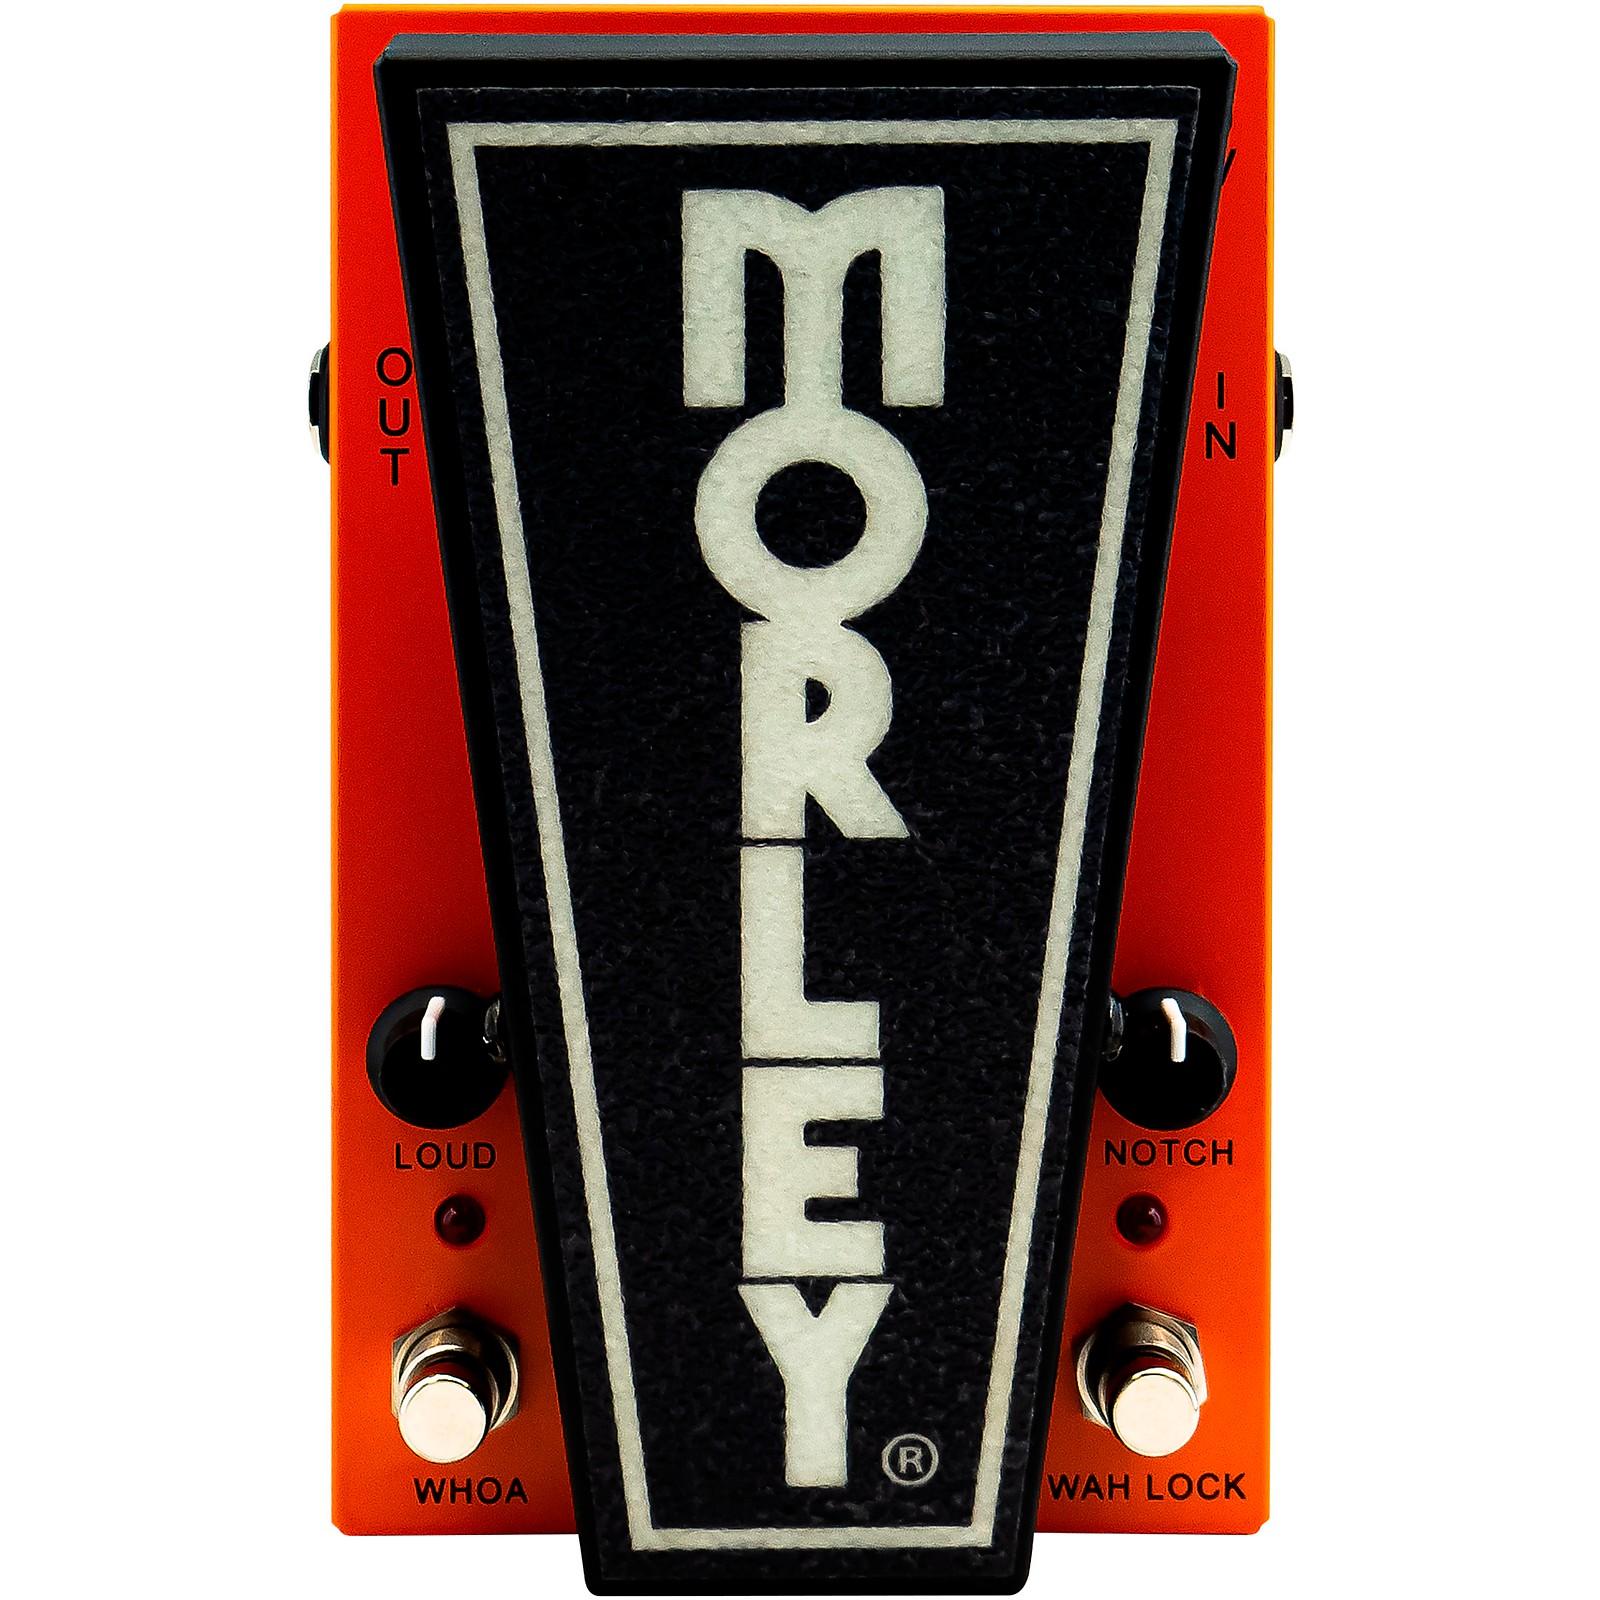 Morley 20/20 Wah Lock Effects Pedal